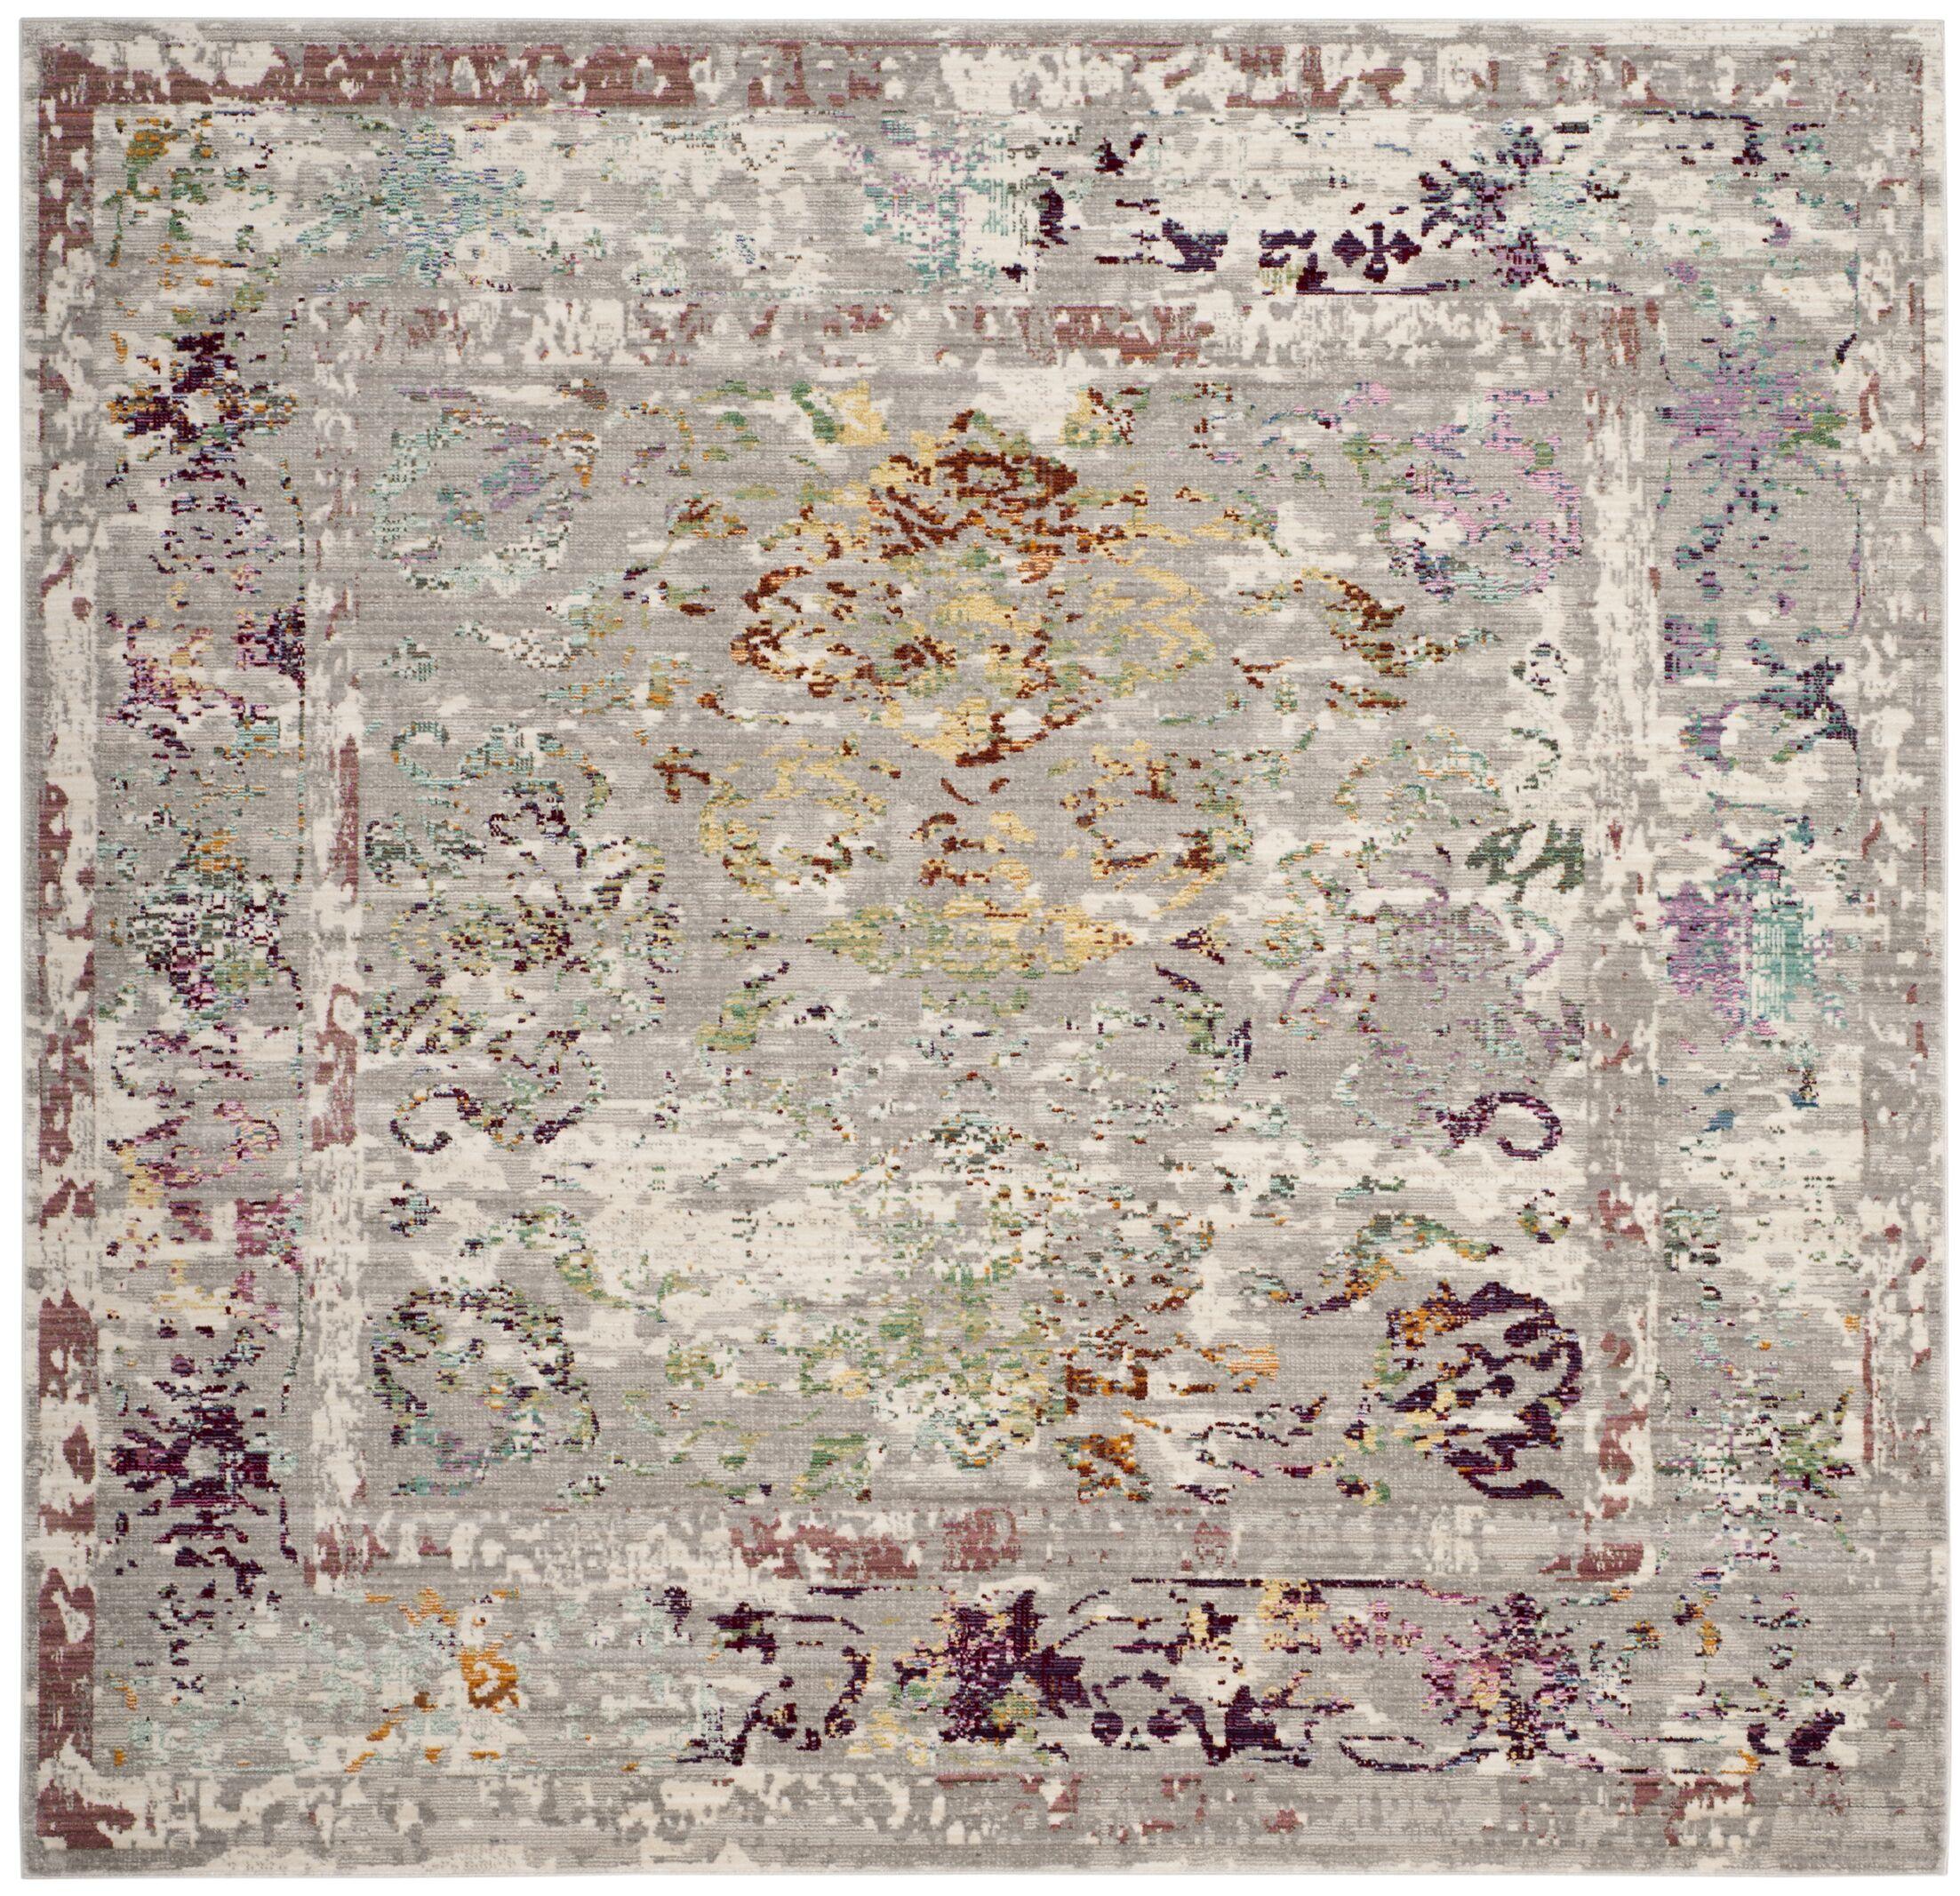 Lulu Rectangle Gray/Multi Area Rug Rug Size: Square 6'7